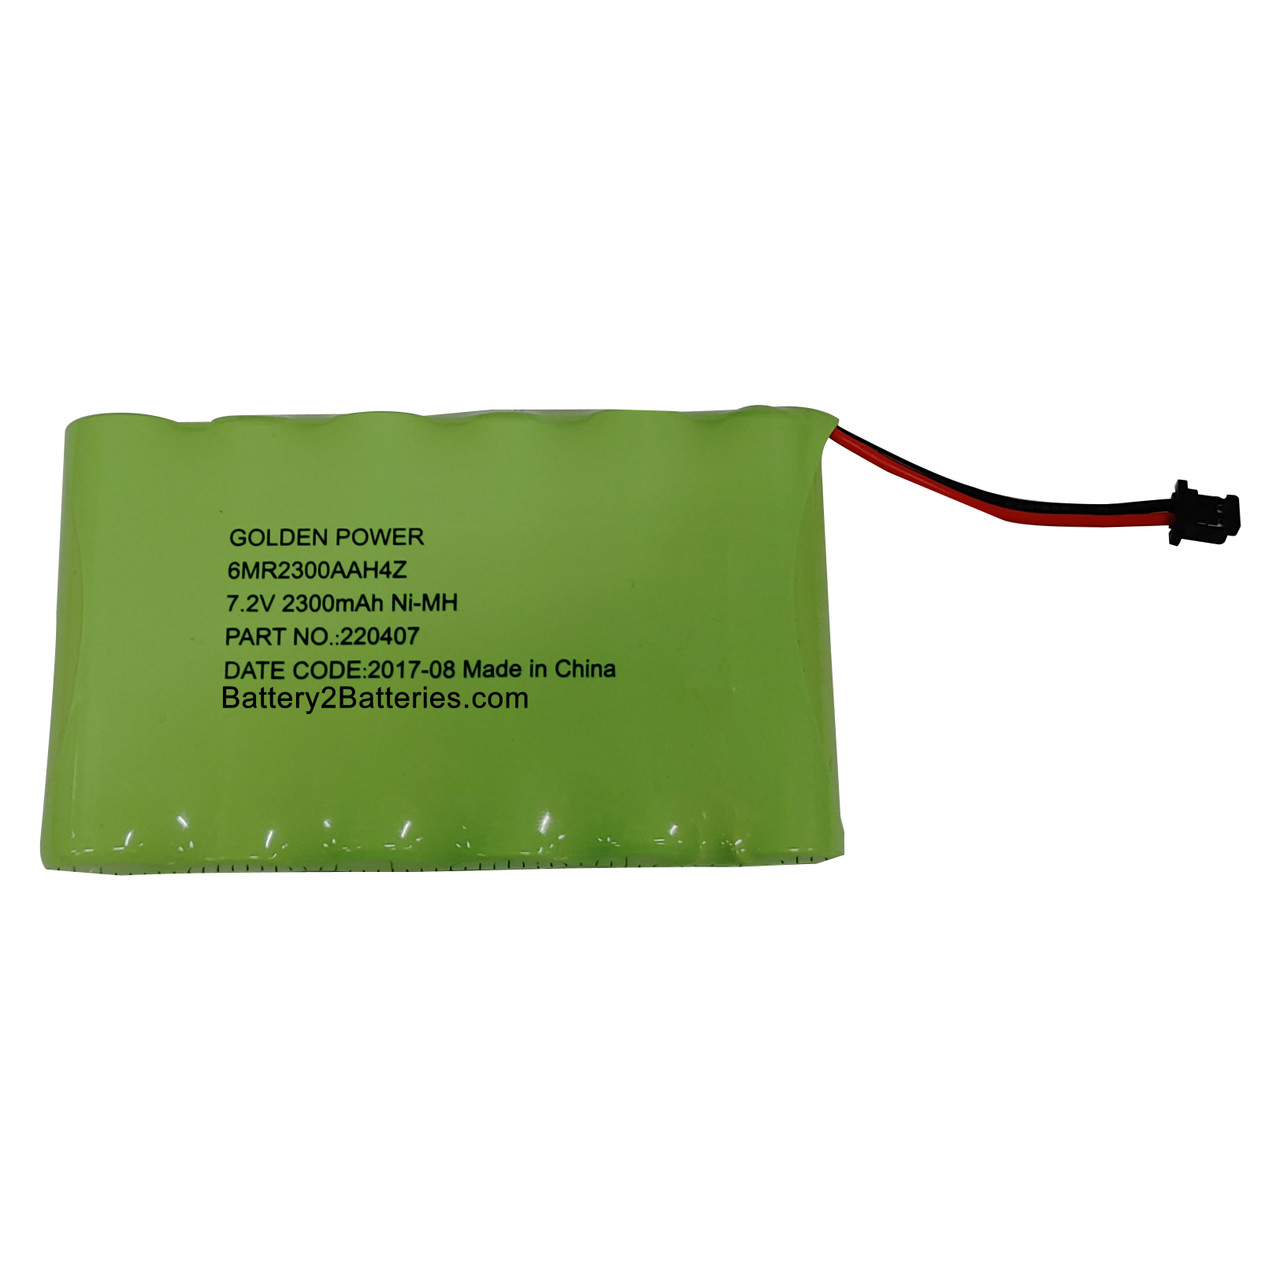 6MR2300AAH4Z Golden Power Battery Replacement